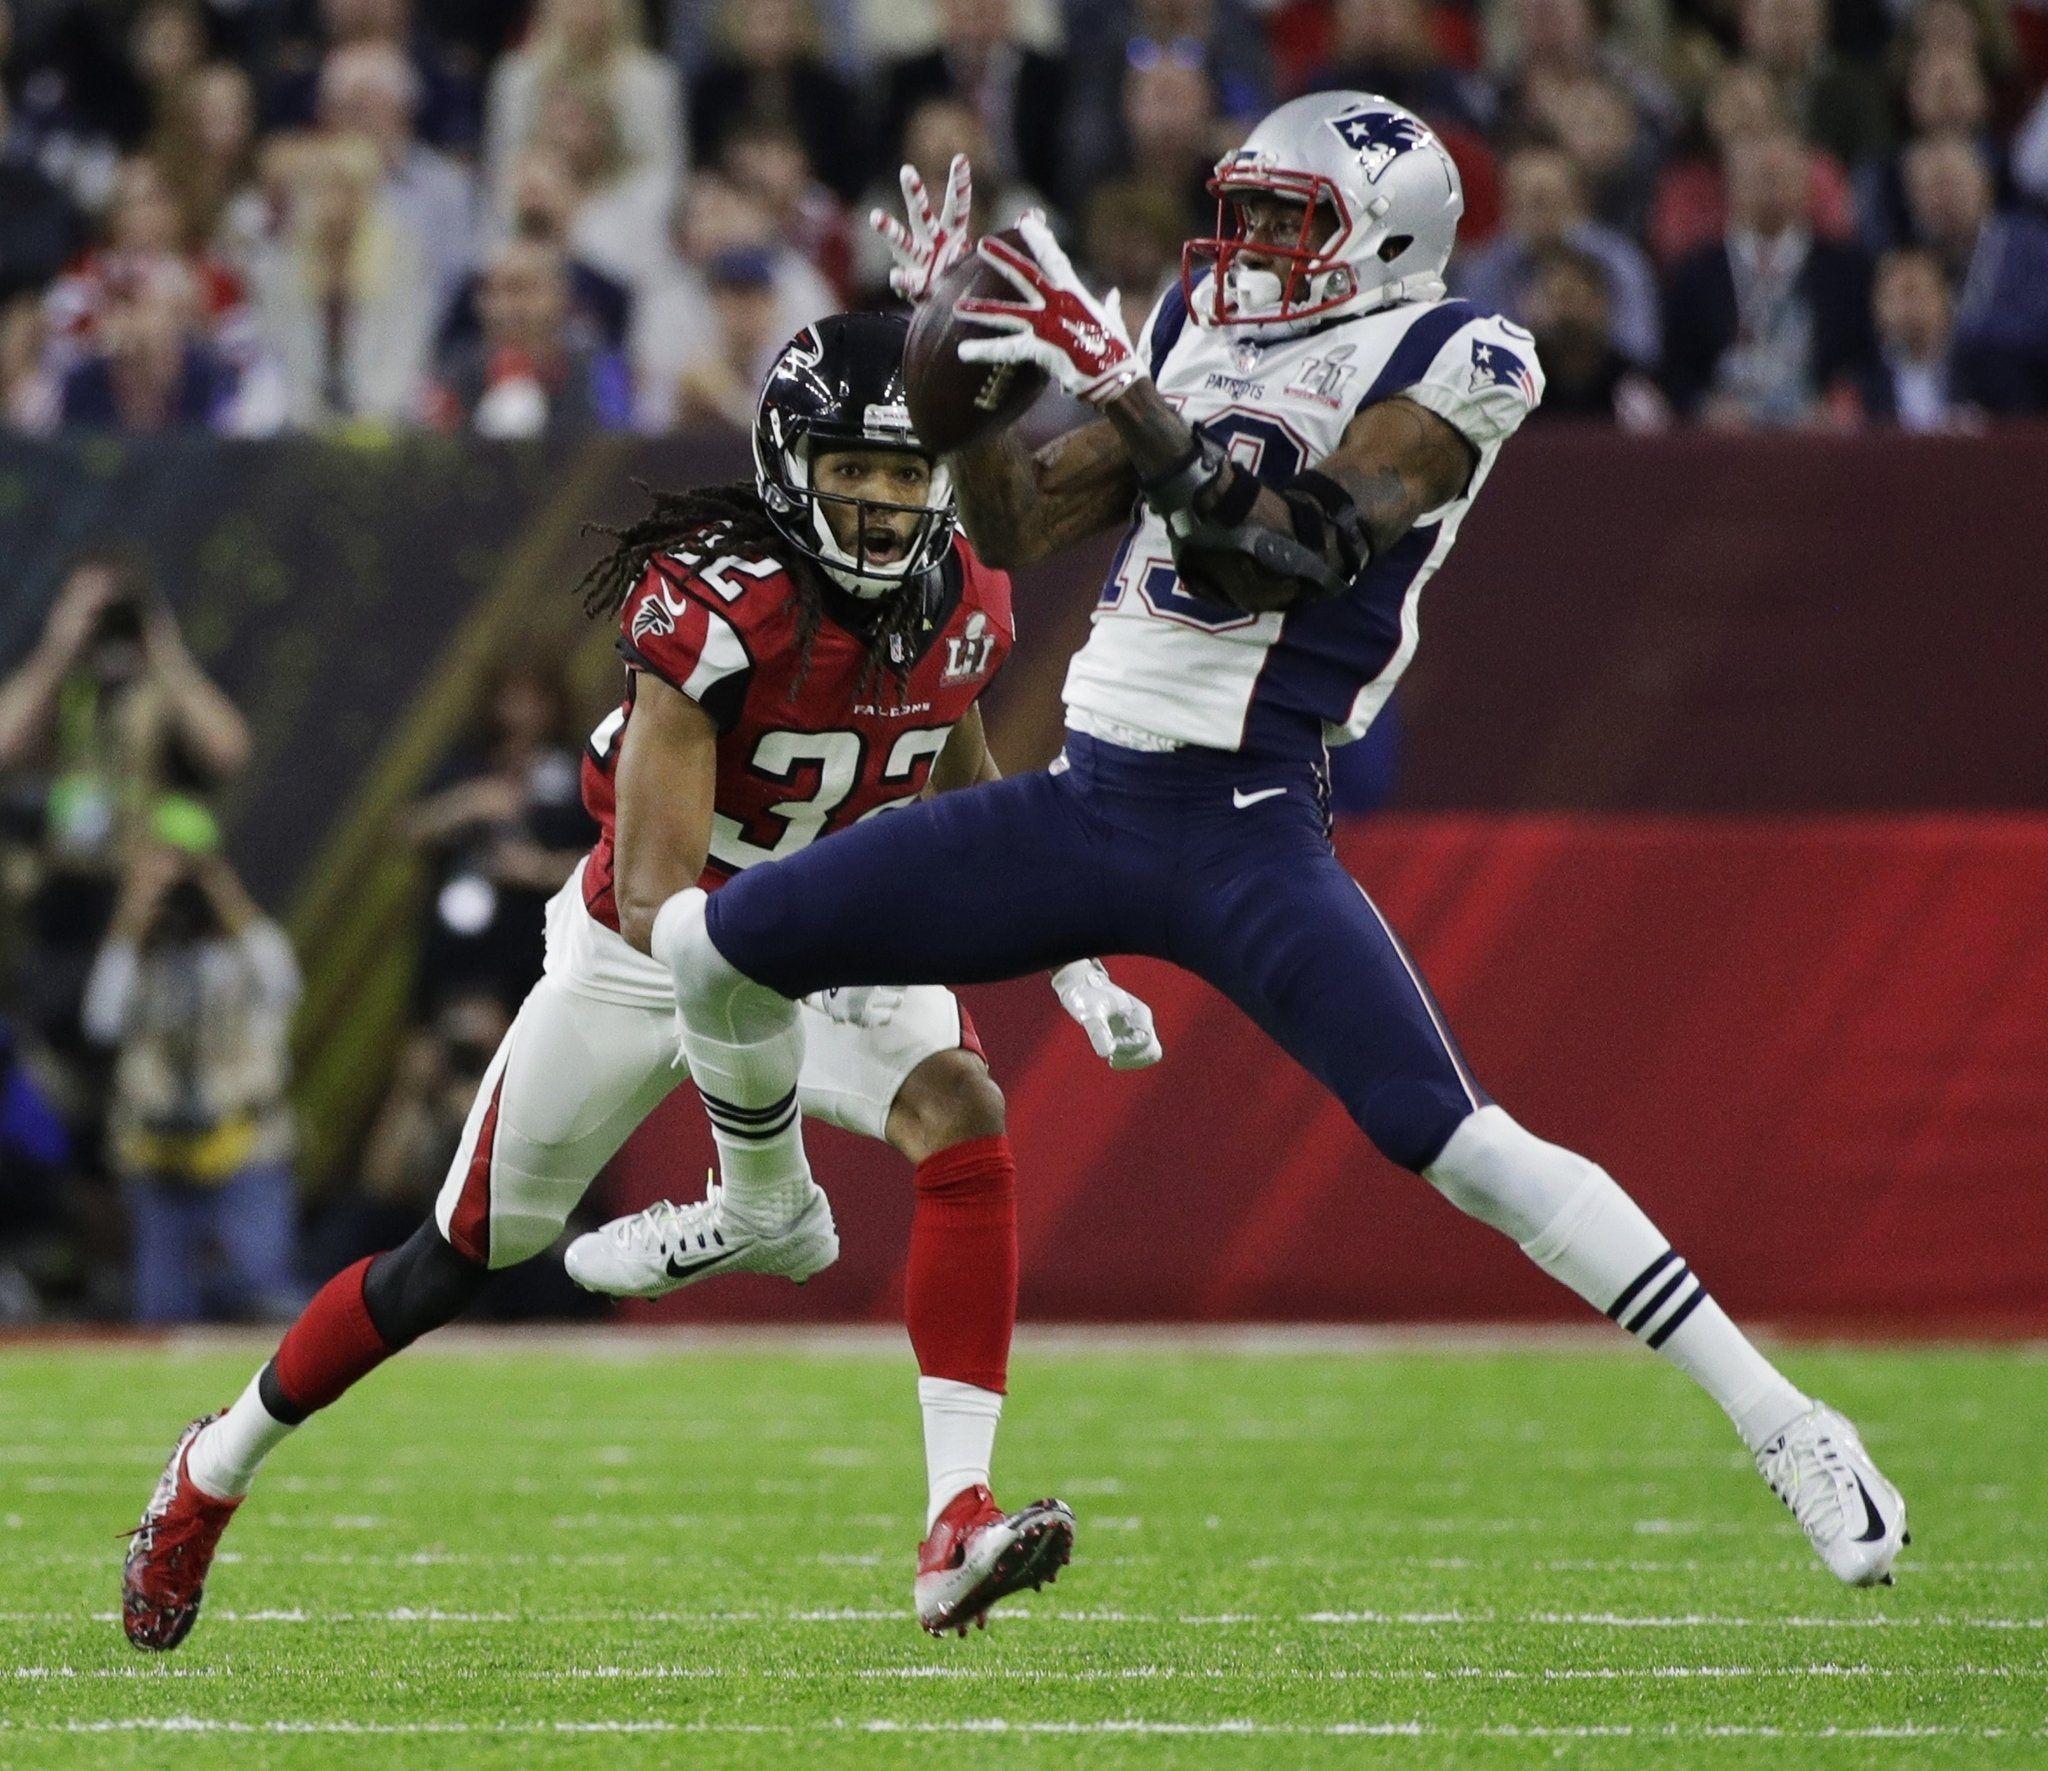 Edelman S Former Professor Apologizes For Doubting He D Make Nfl New England Patriots Super Bowl Li Patriots